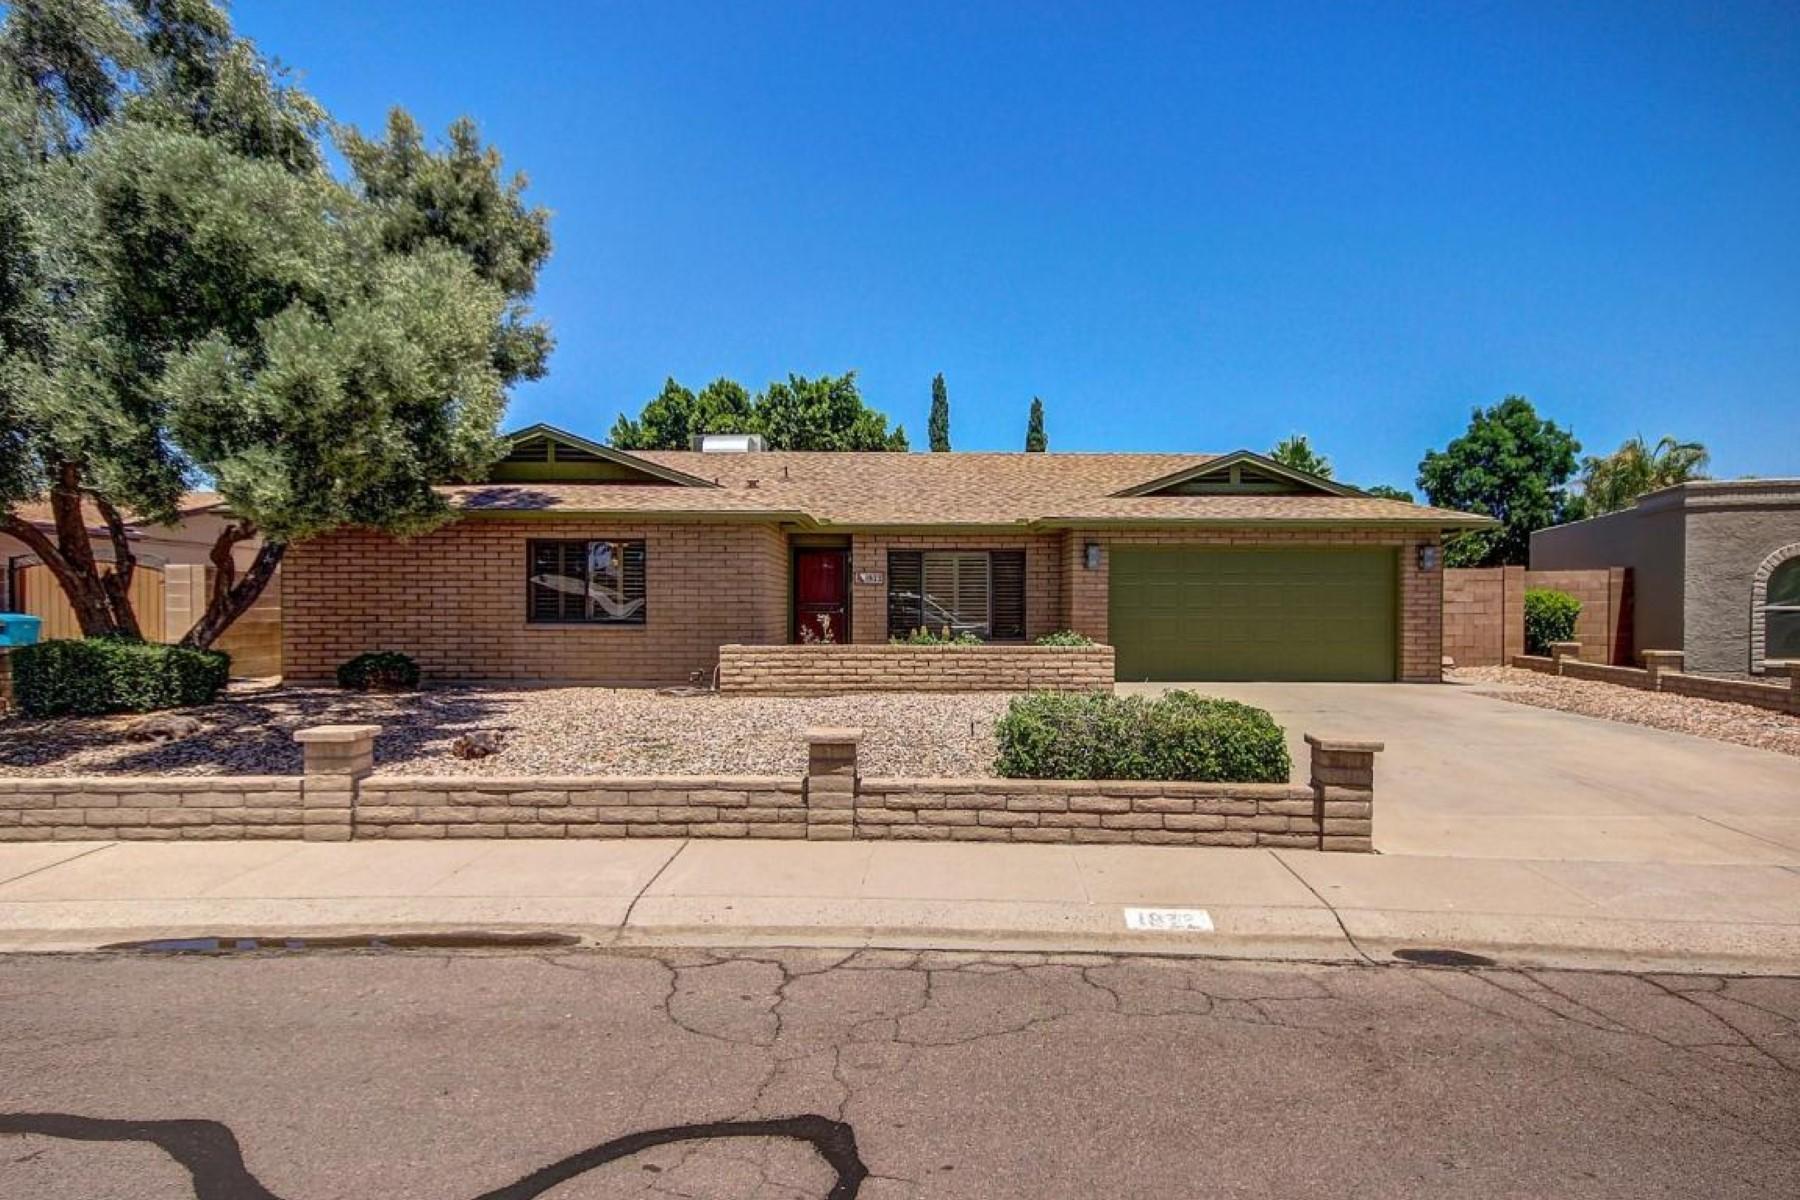 独户住宅 为 销售 在 Lovely home in a highly desirable community 1822 W ACOMA DR 菲尼克斯(凤凰城), 亚利桑那州, 85023 美国